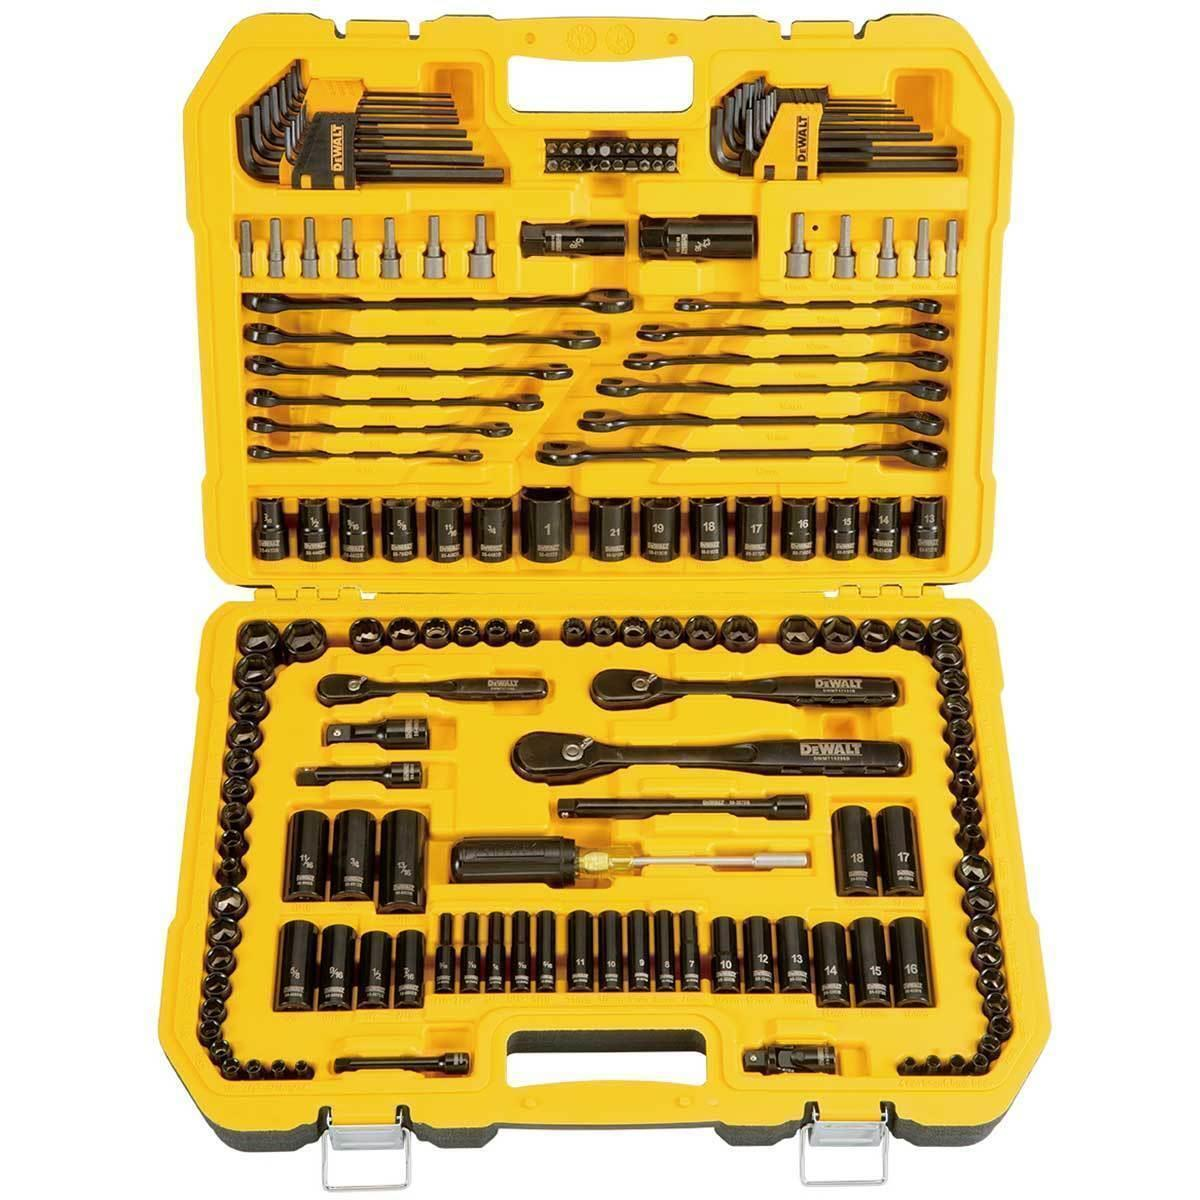 DEWALT 181 Piece Mechanics Tool Kit Spanner Socket Set Ratch